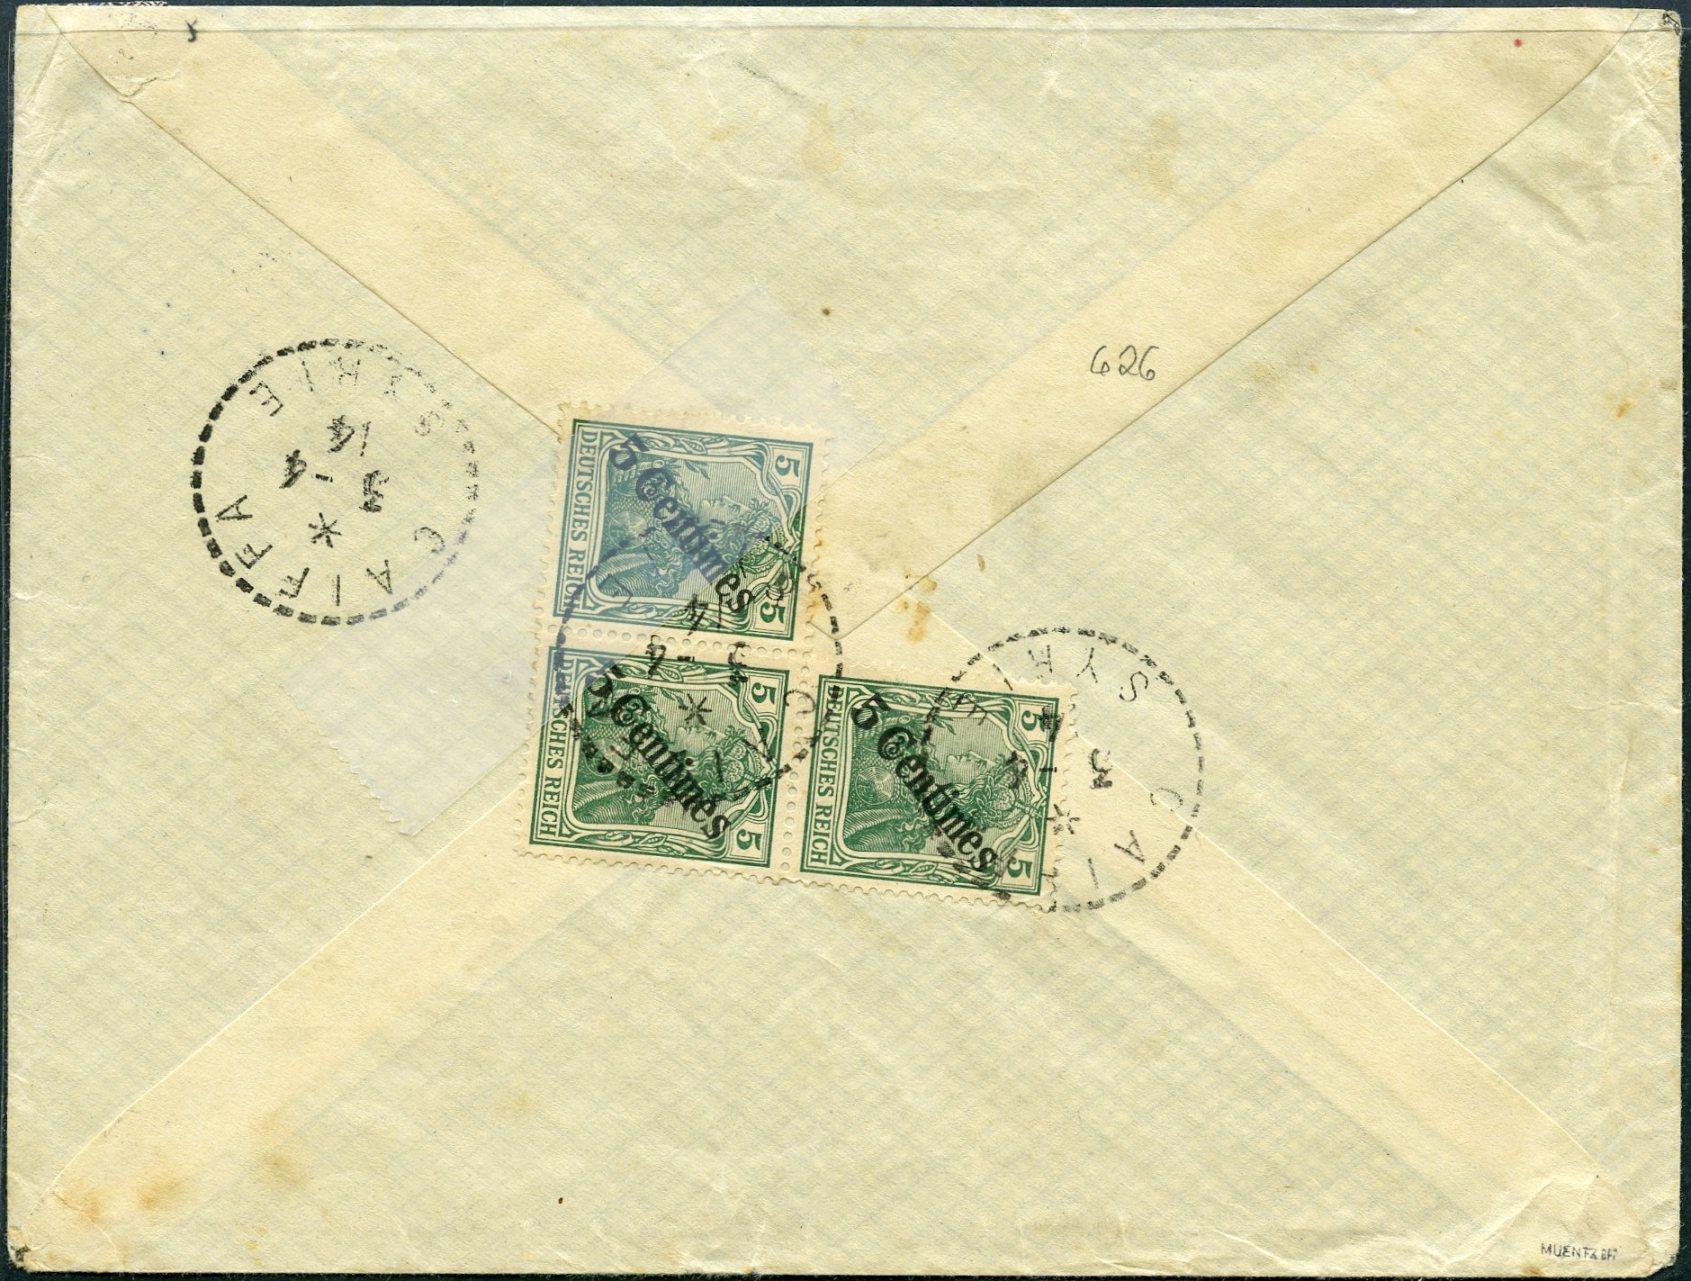 Lot 49 - THE GERMAN POST  -  Tel Aviv Stamps Ltd. Auction #47